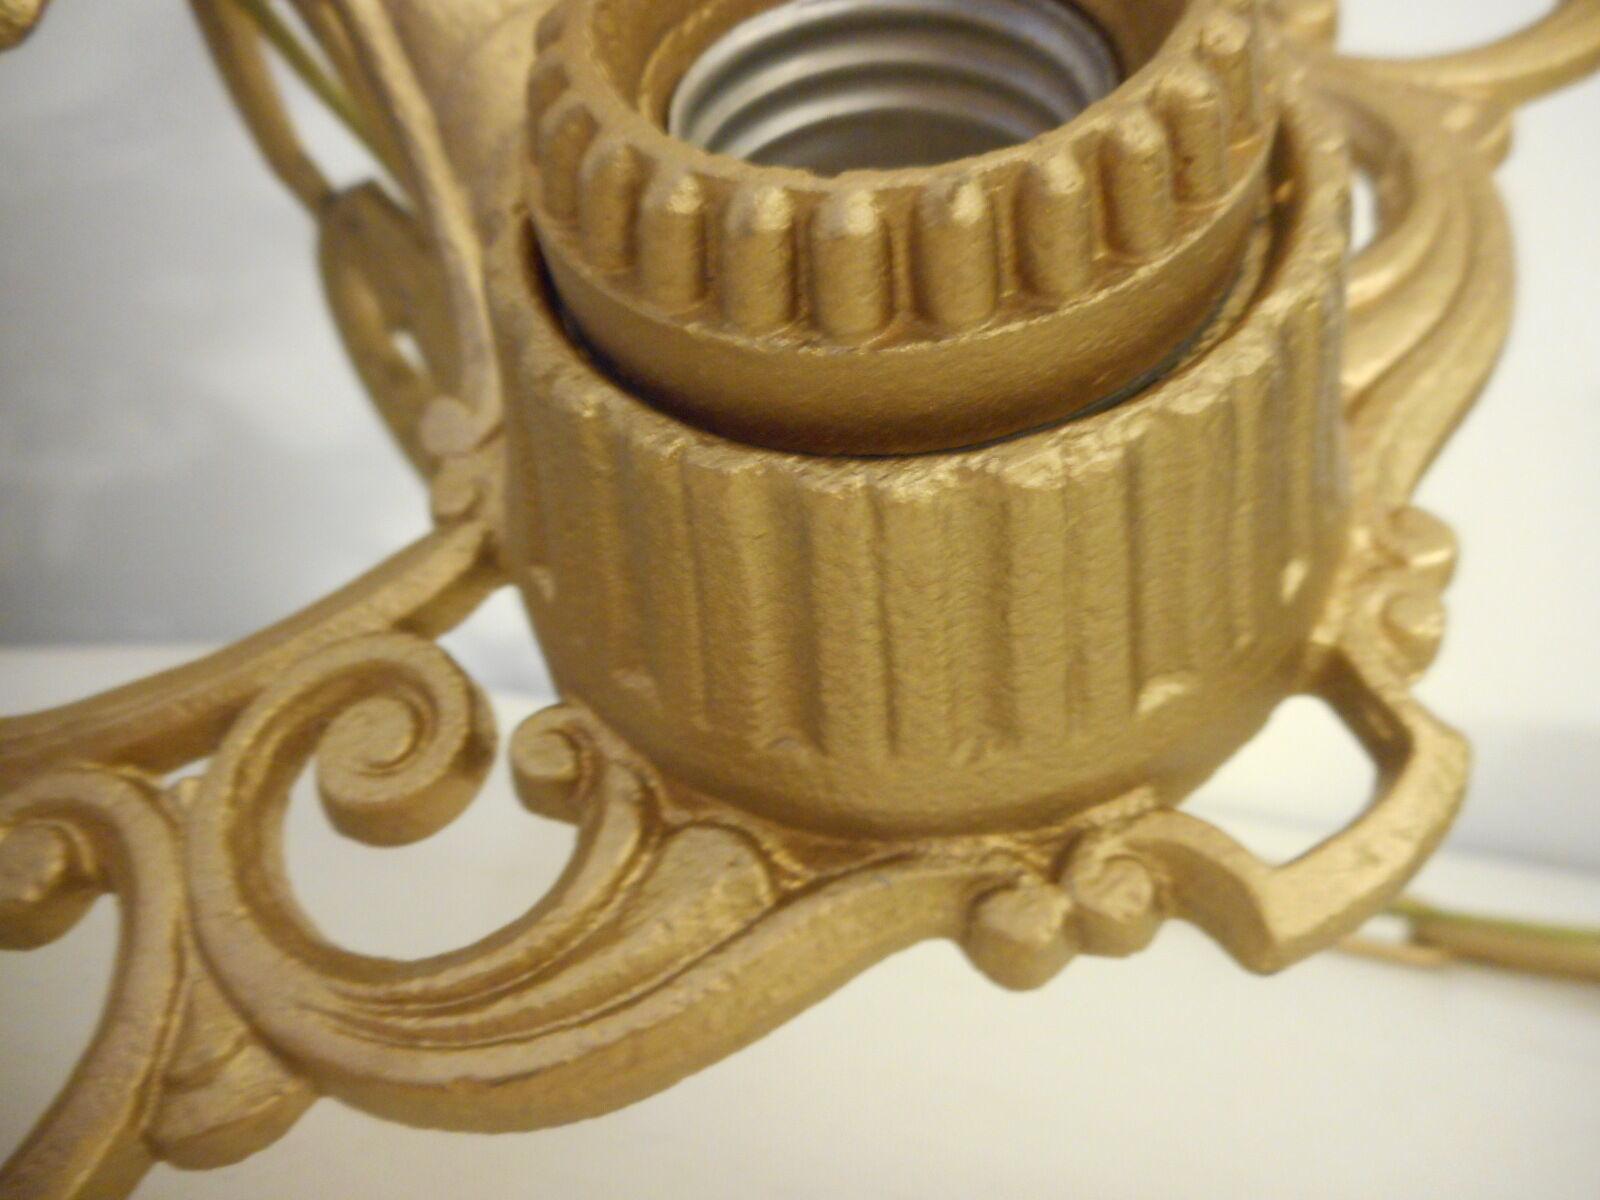 Vintage Antique Art Deco  5 Bulb Hanging Light Fixture Restored matte gold color